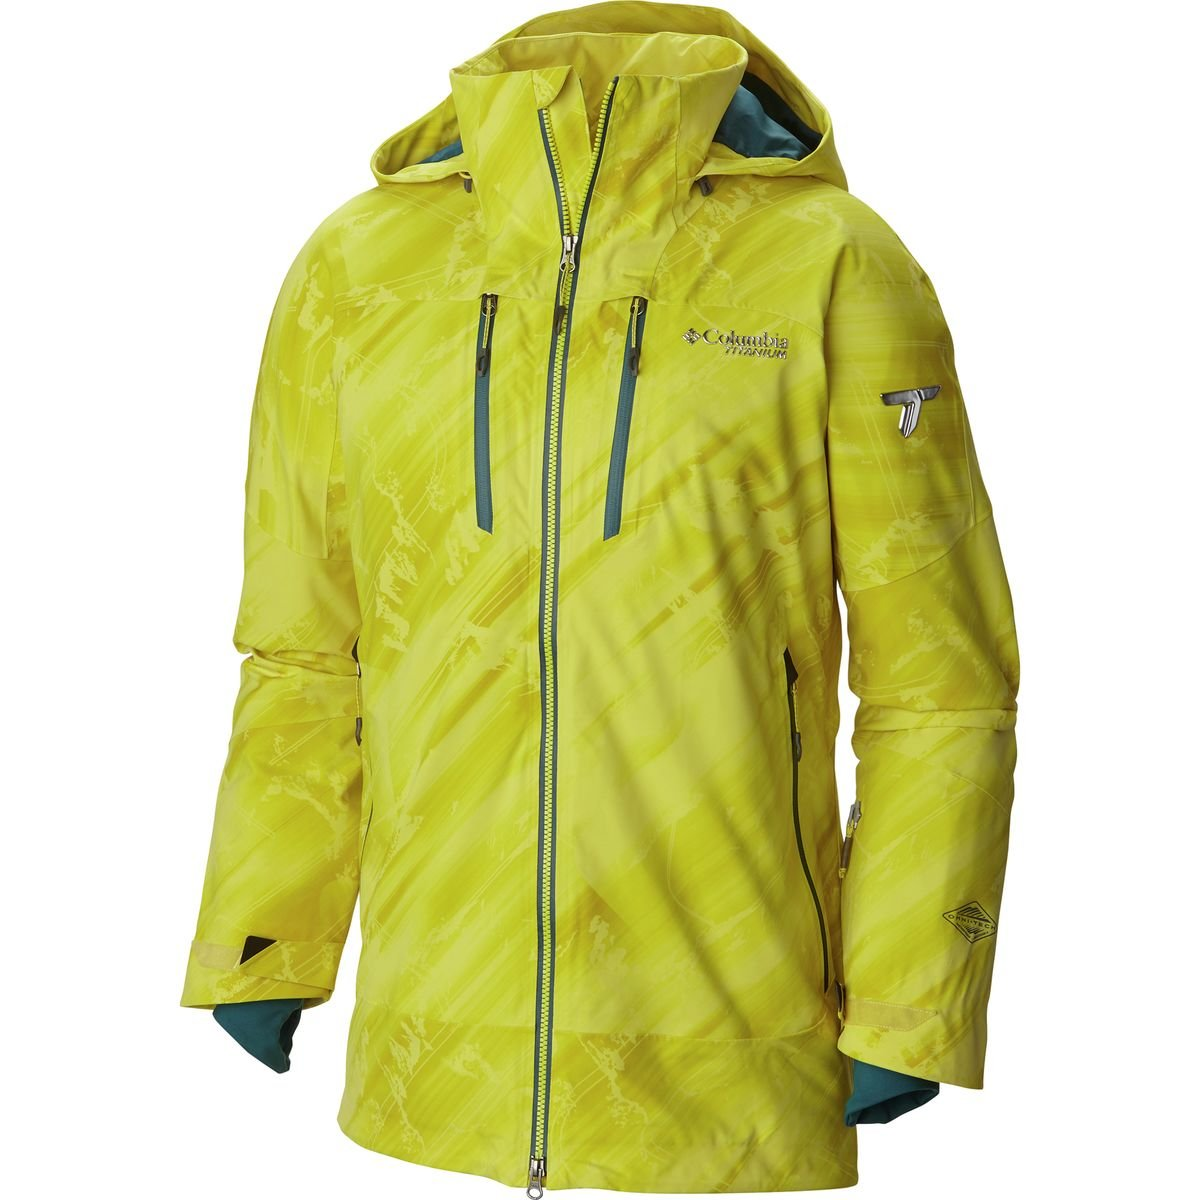 Columbia Mens Shreddin Jacket